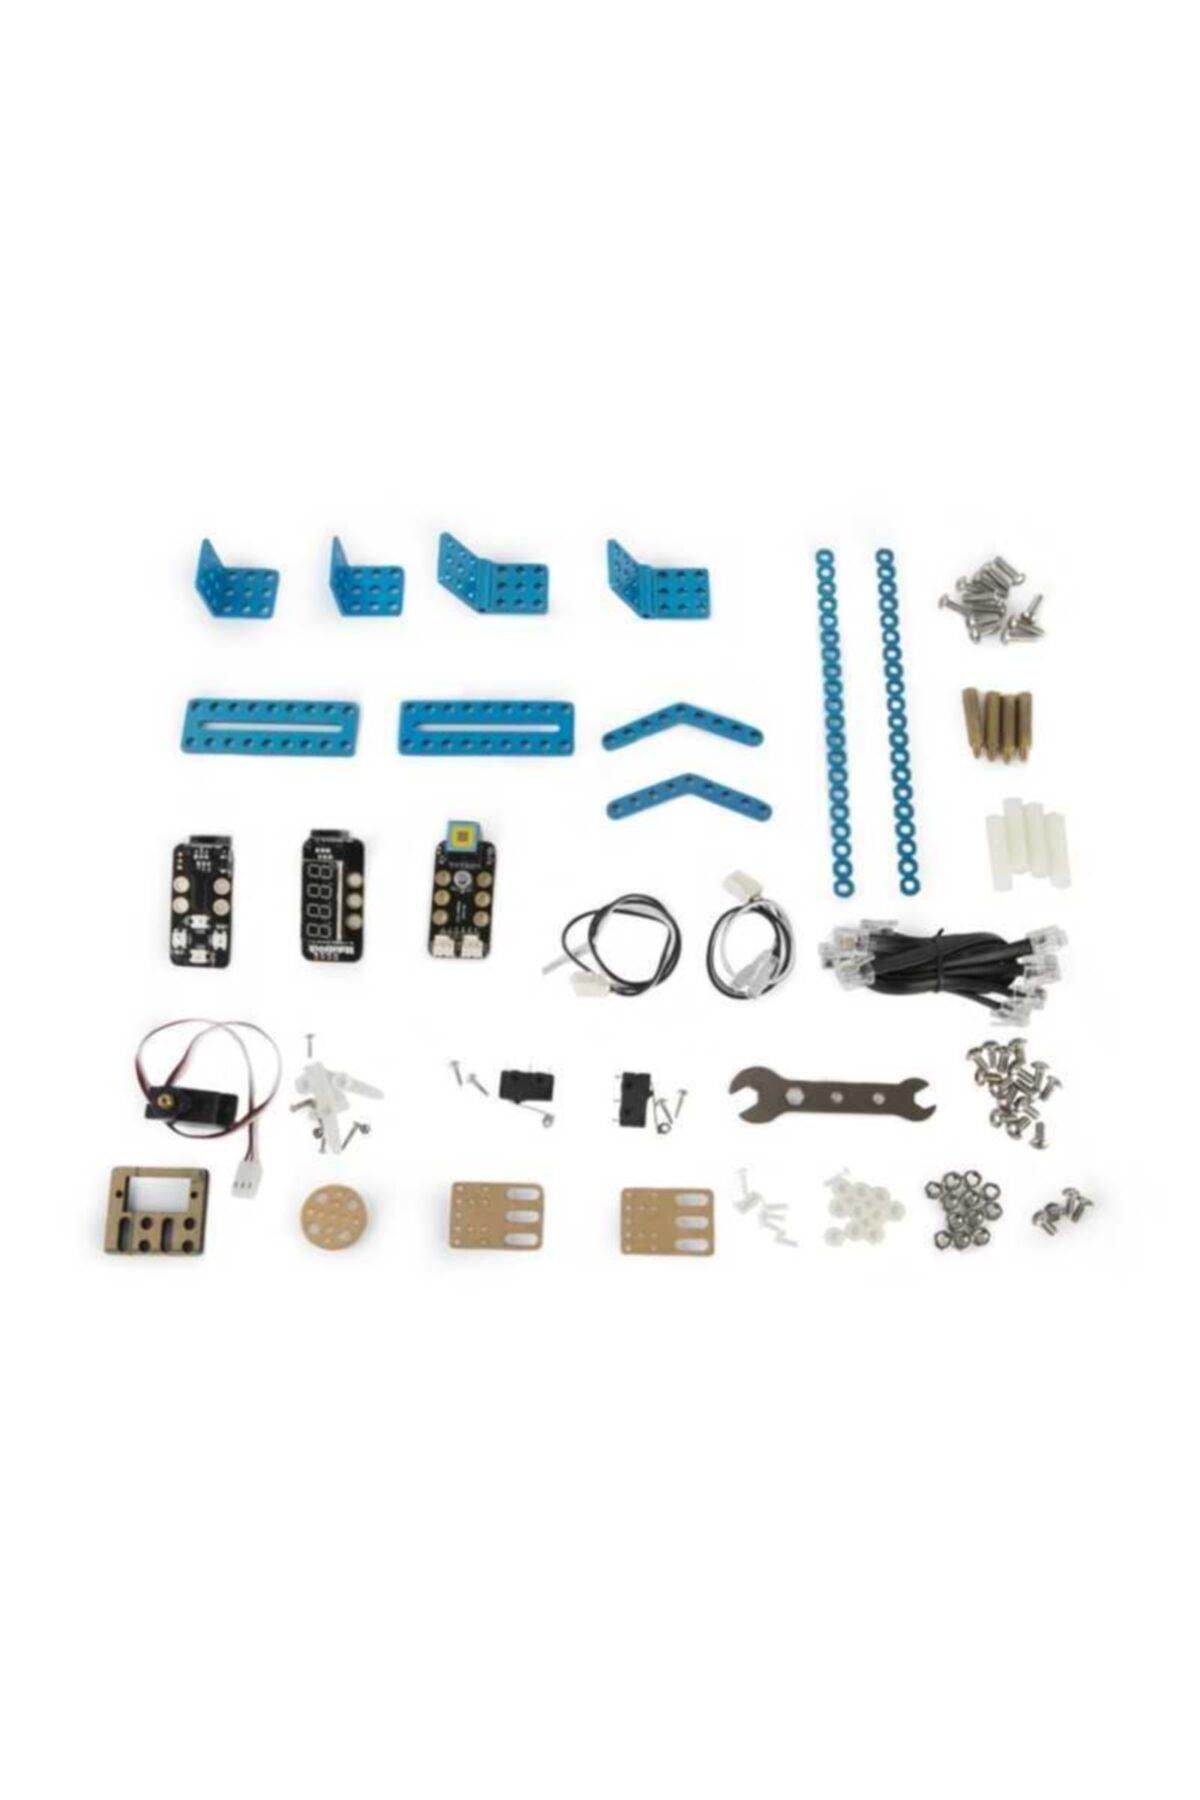 MakeBlock Mbot Ve Mbot Ranger Için Variety Gizmos Eklenti Paketi 1